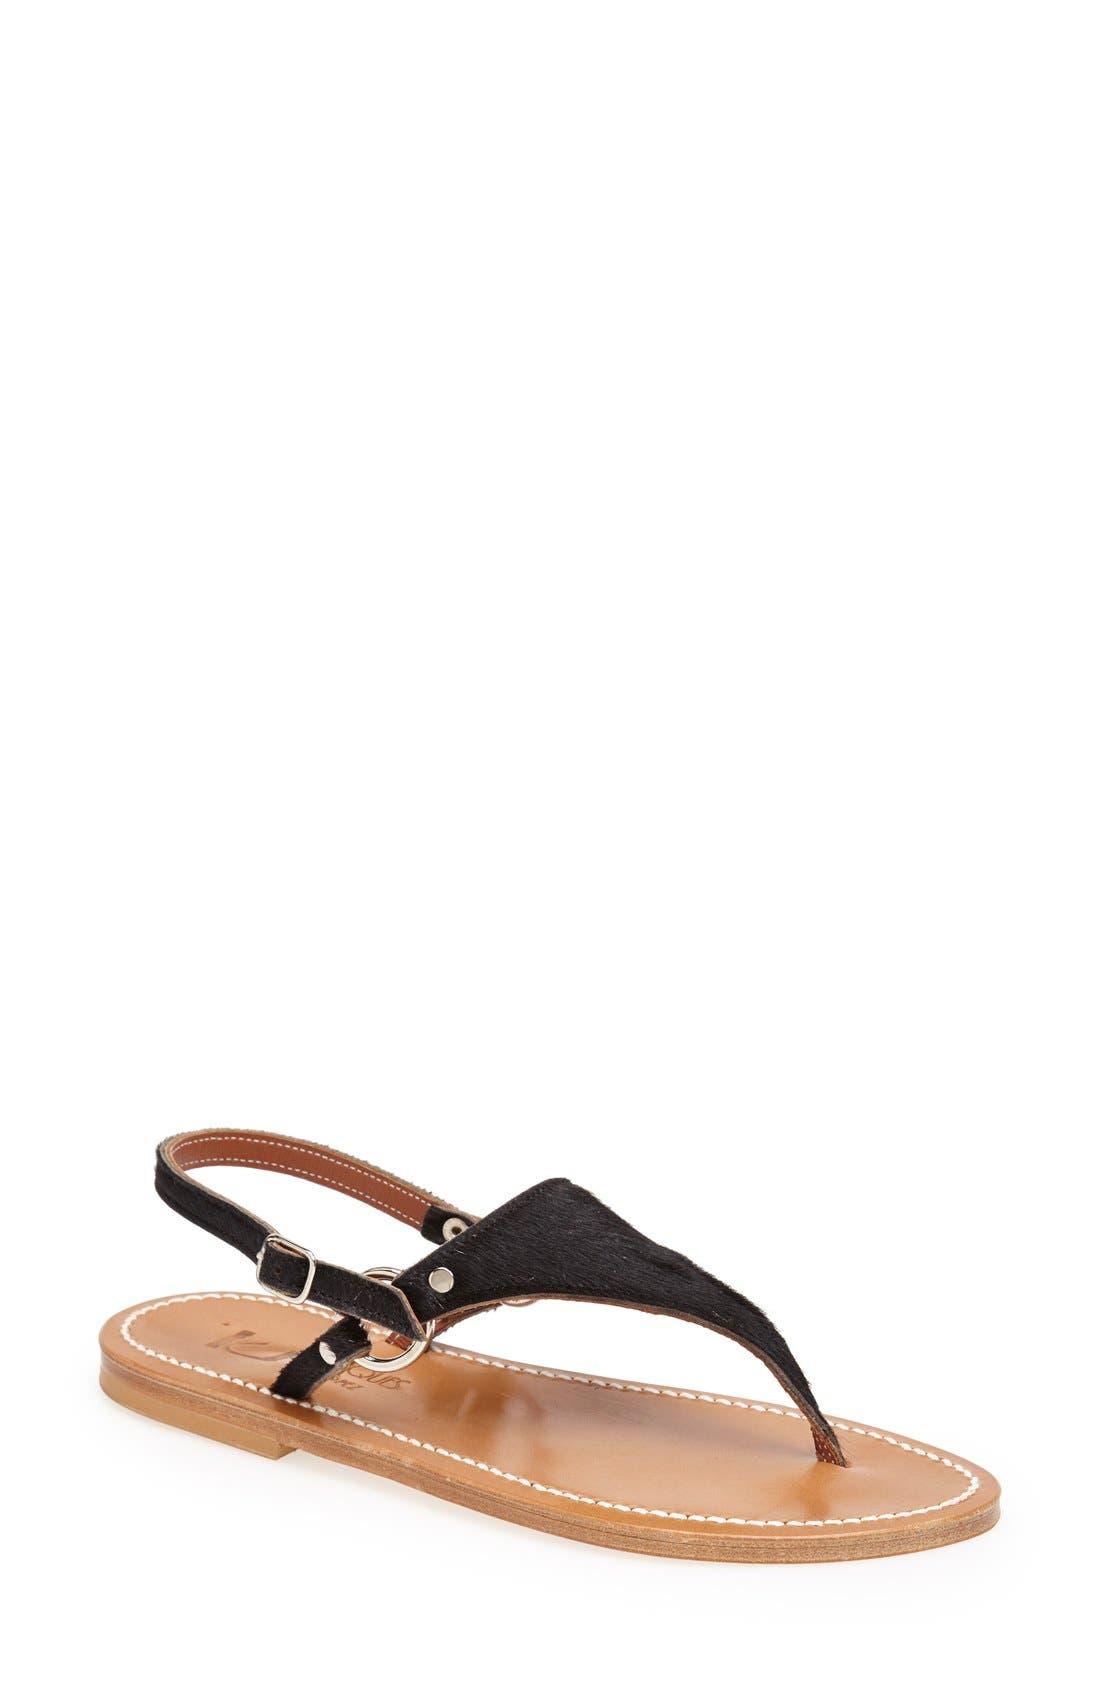 Main Image - K.Jacques St. Tropez 'Triton' V Strap Calf Hair Thong Sandal (Women)